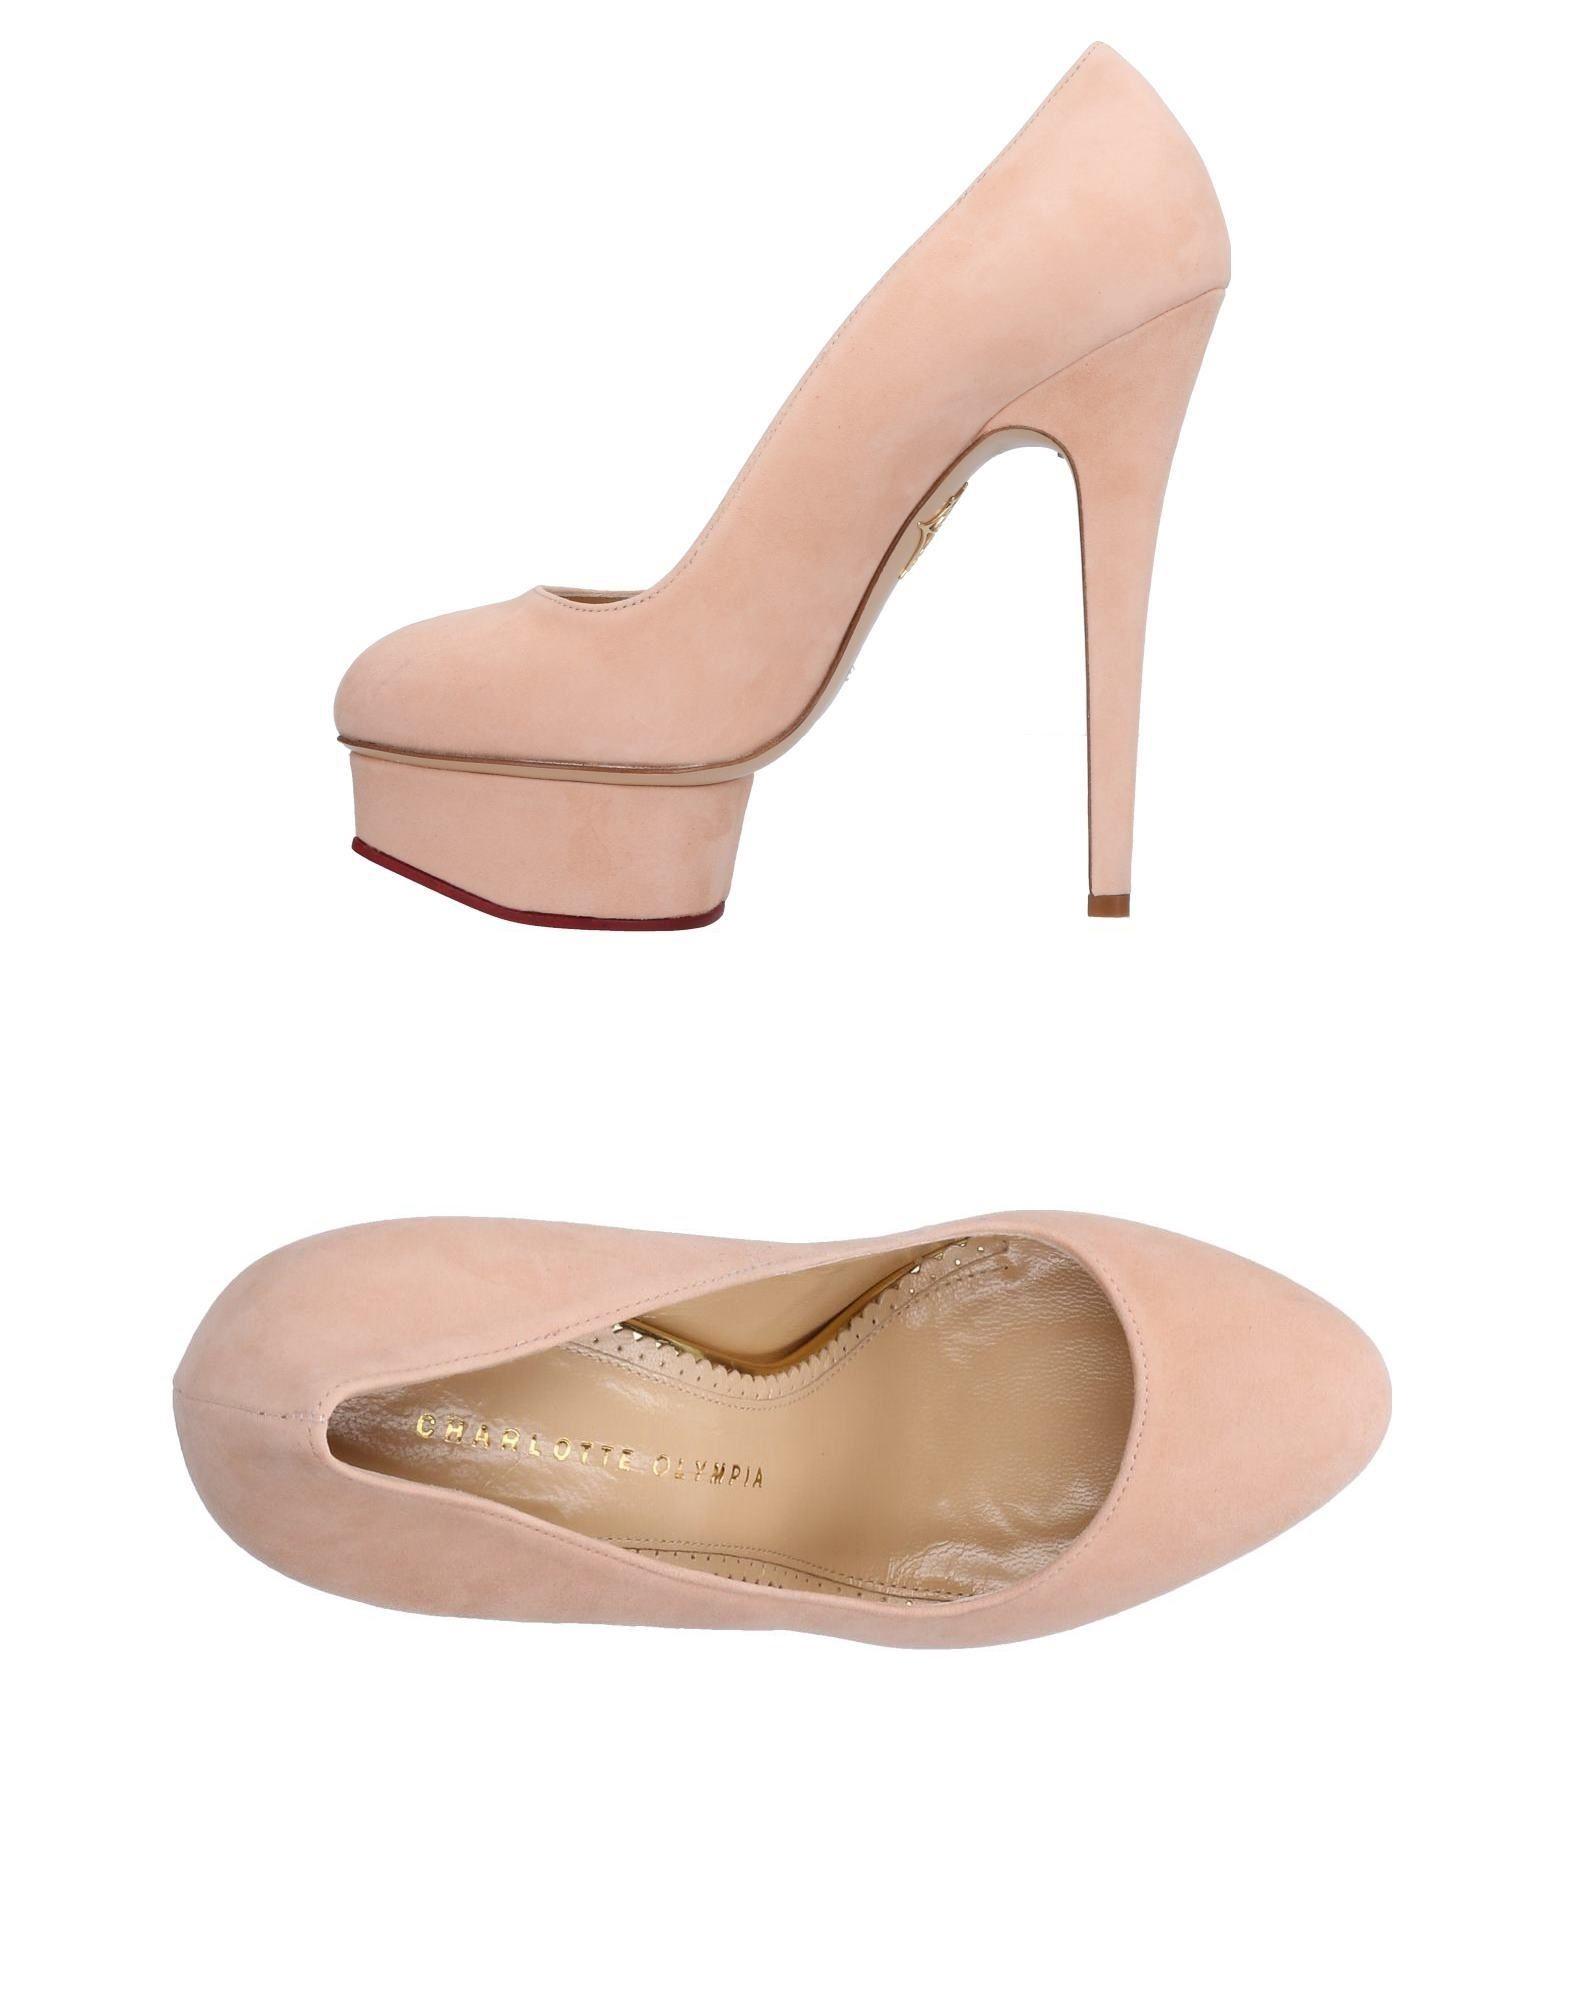 Charlotte Olympia Pumps Damen  11500050FBGut aussehende strapazierfähige Schuhe